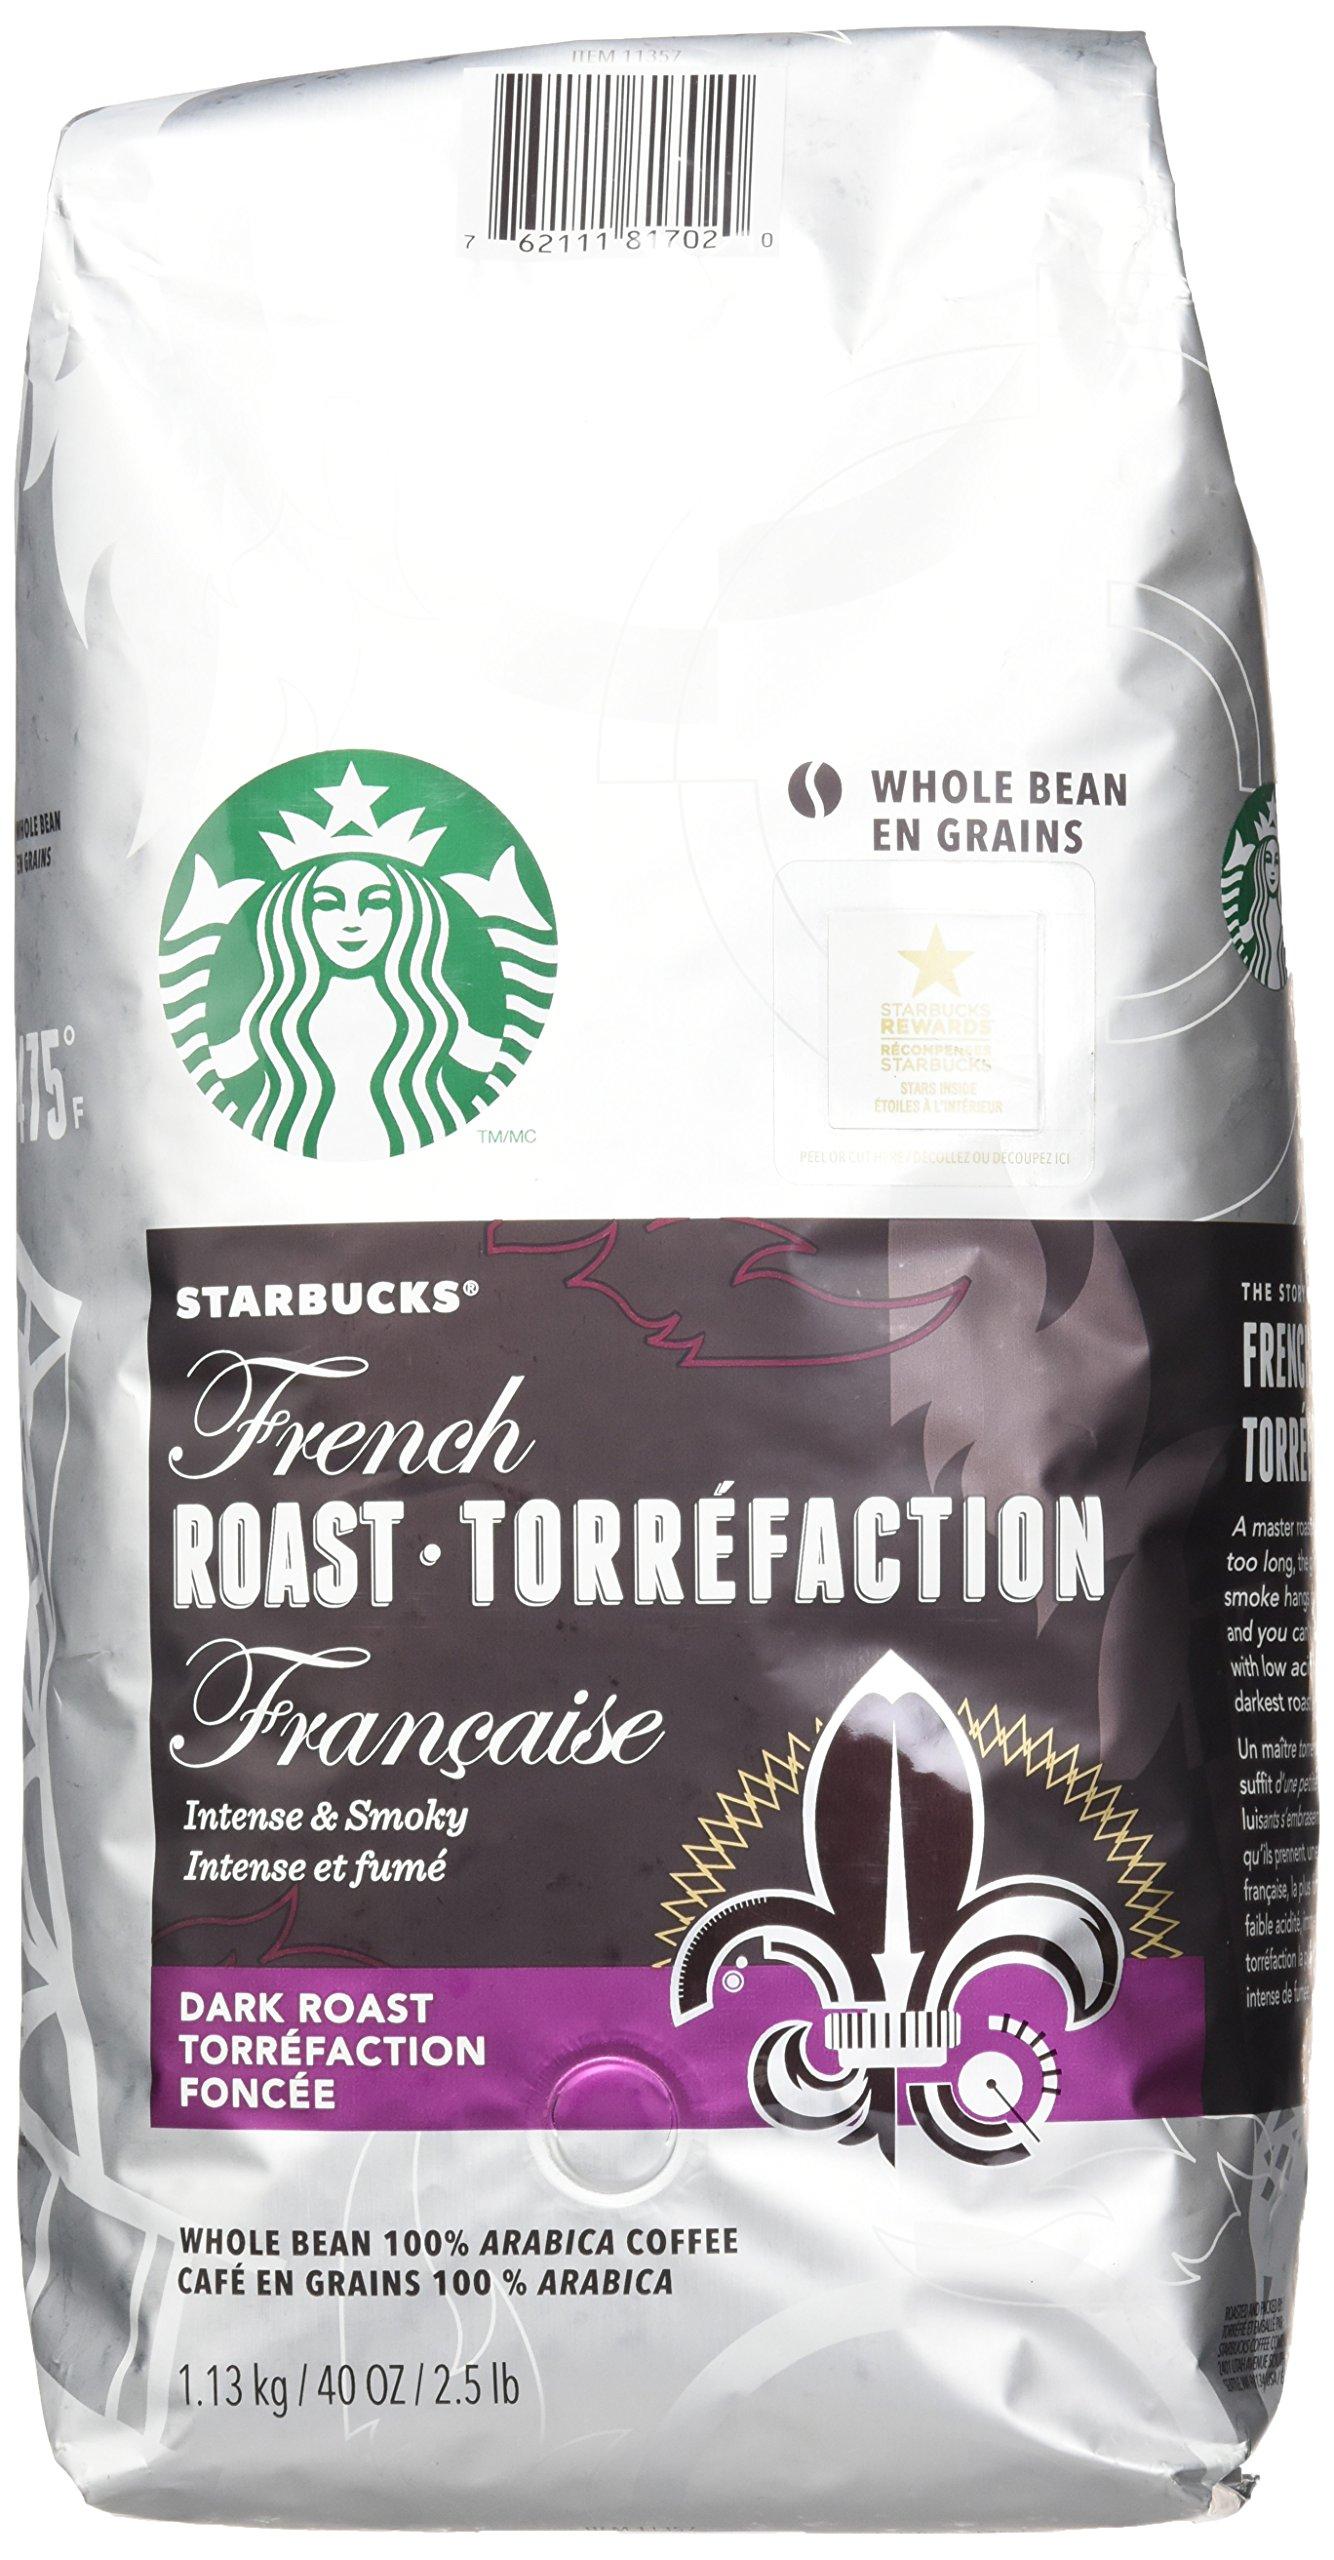 Starbucks Breakfast Blend Medium Roast Whole Bean Coffee, 12-Ounce Bag (Pack of 6) $39.84 (or less) fs w/S&S @5% @ amazon